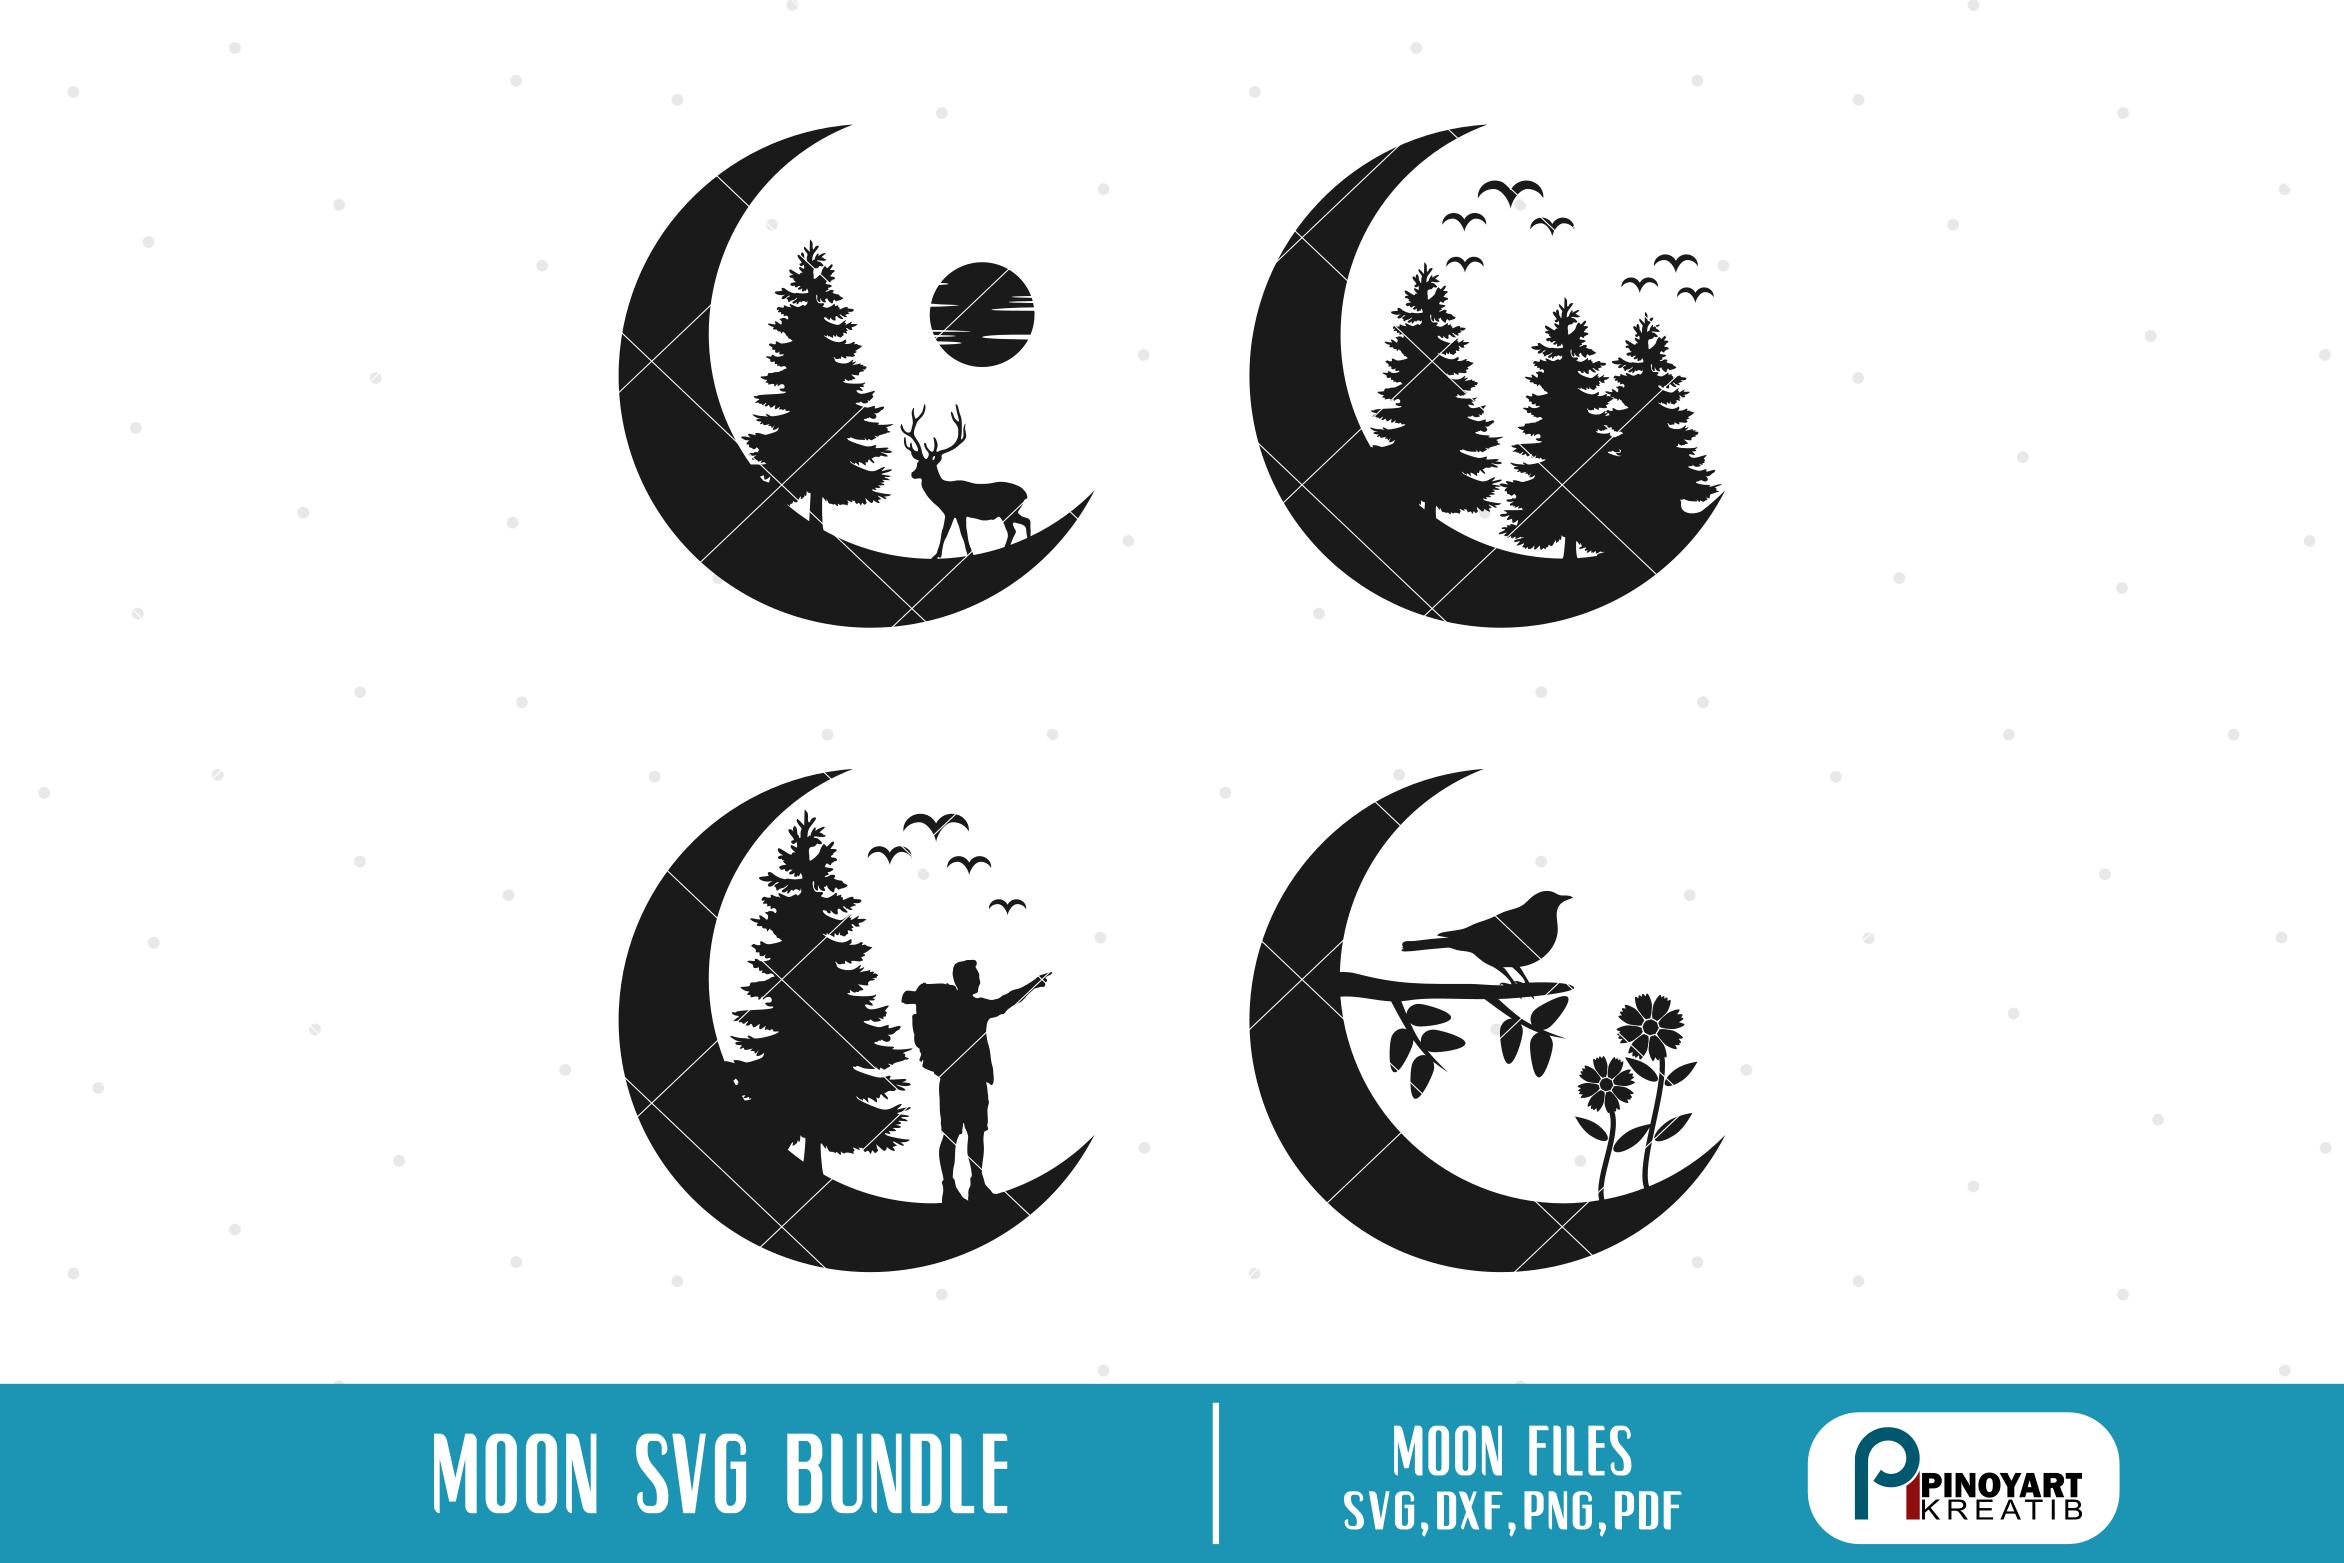 Moon Silhouette Bundle Graphic By Pinoyartkreatib Creative Fabrica Moon Silhouette Mountain Svg Silhouette Svg